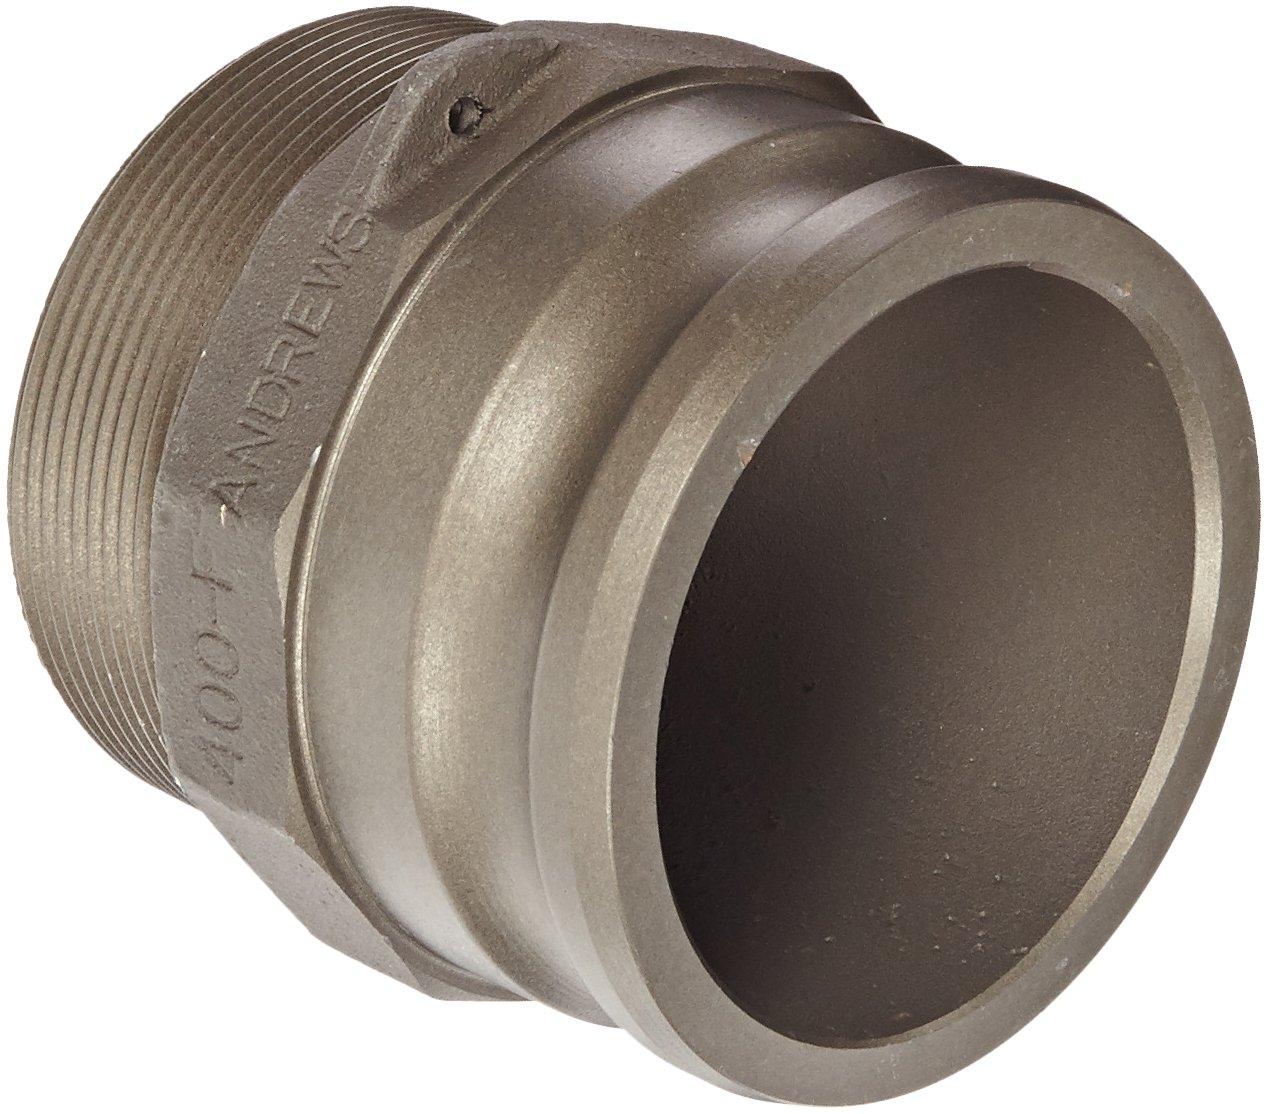 Dixon Valve 400-F-ALH Aluminum Hard Coat Boss-Lock Type F Cam and Groove Fitting 4 Male Adapter x 4 NPT Male 4 Male Adapter x 4 NPT Male Dixon Valve /& Coupling